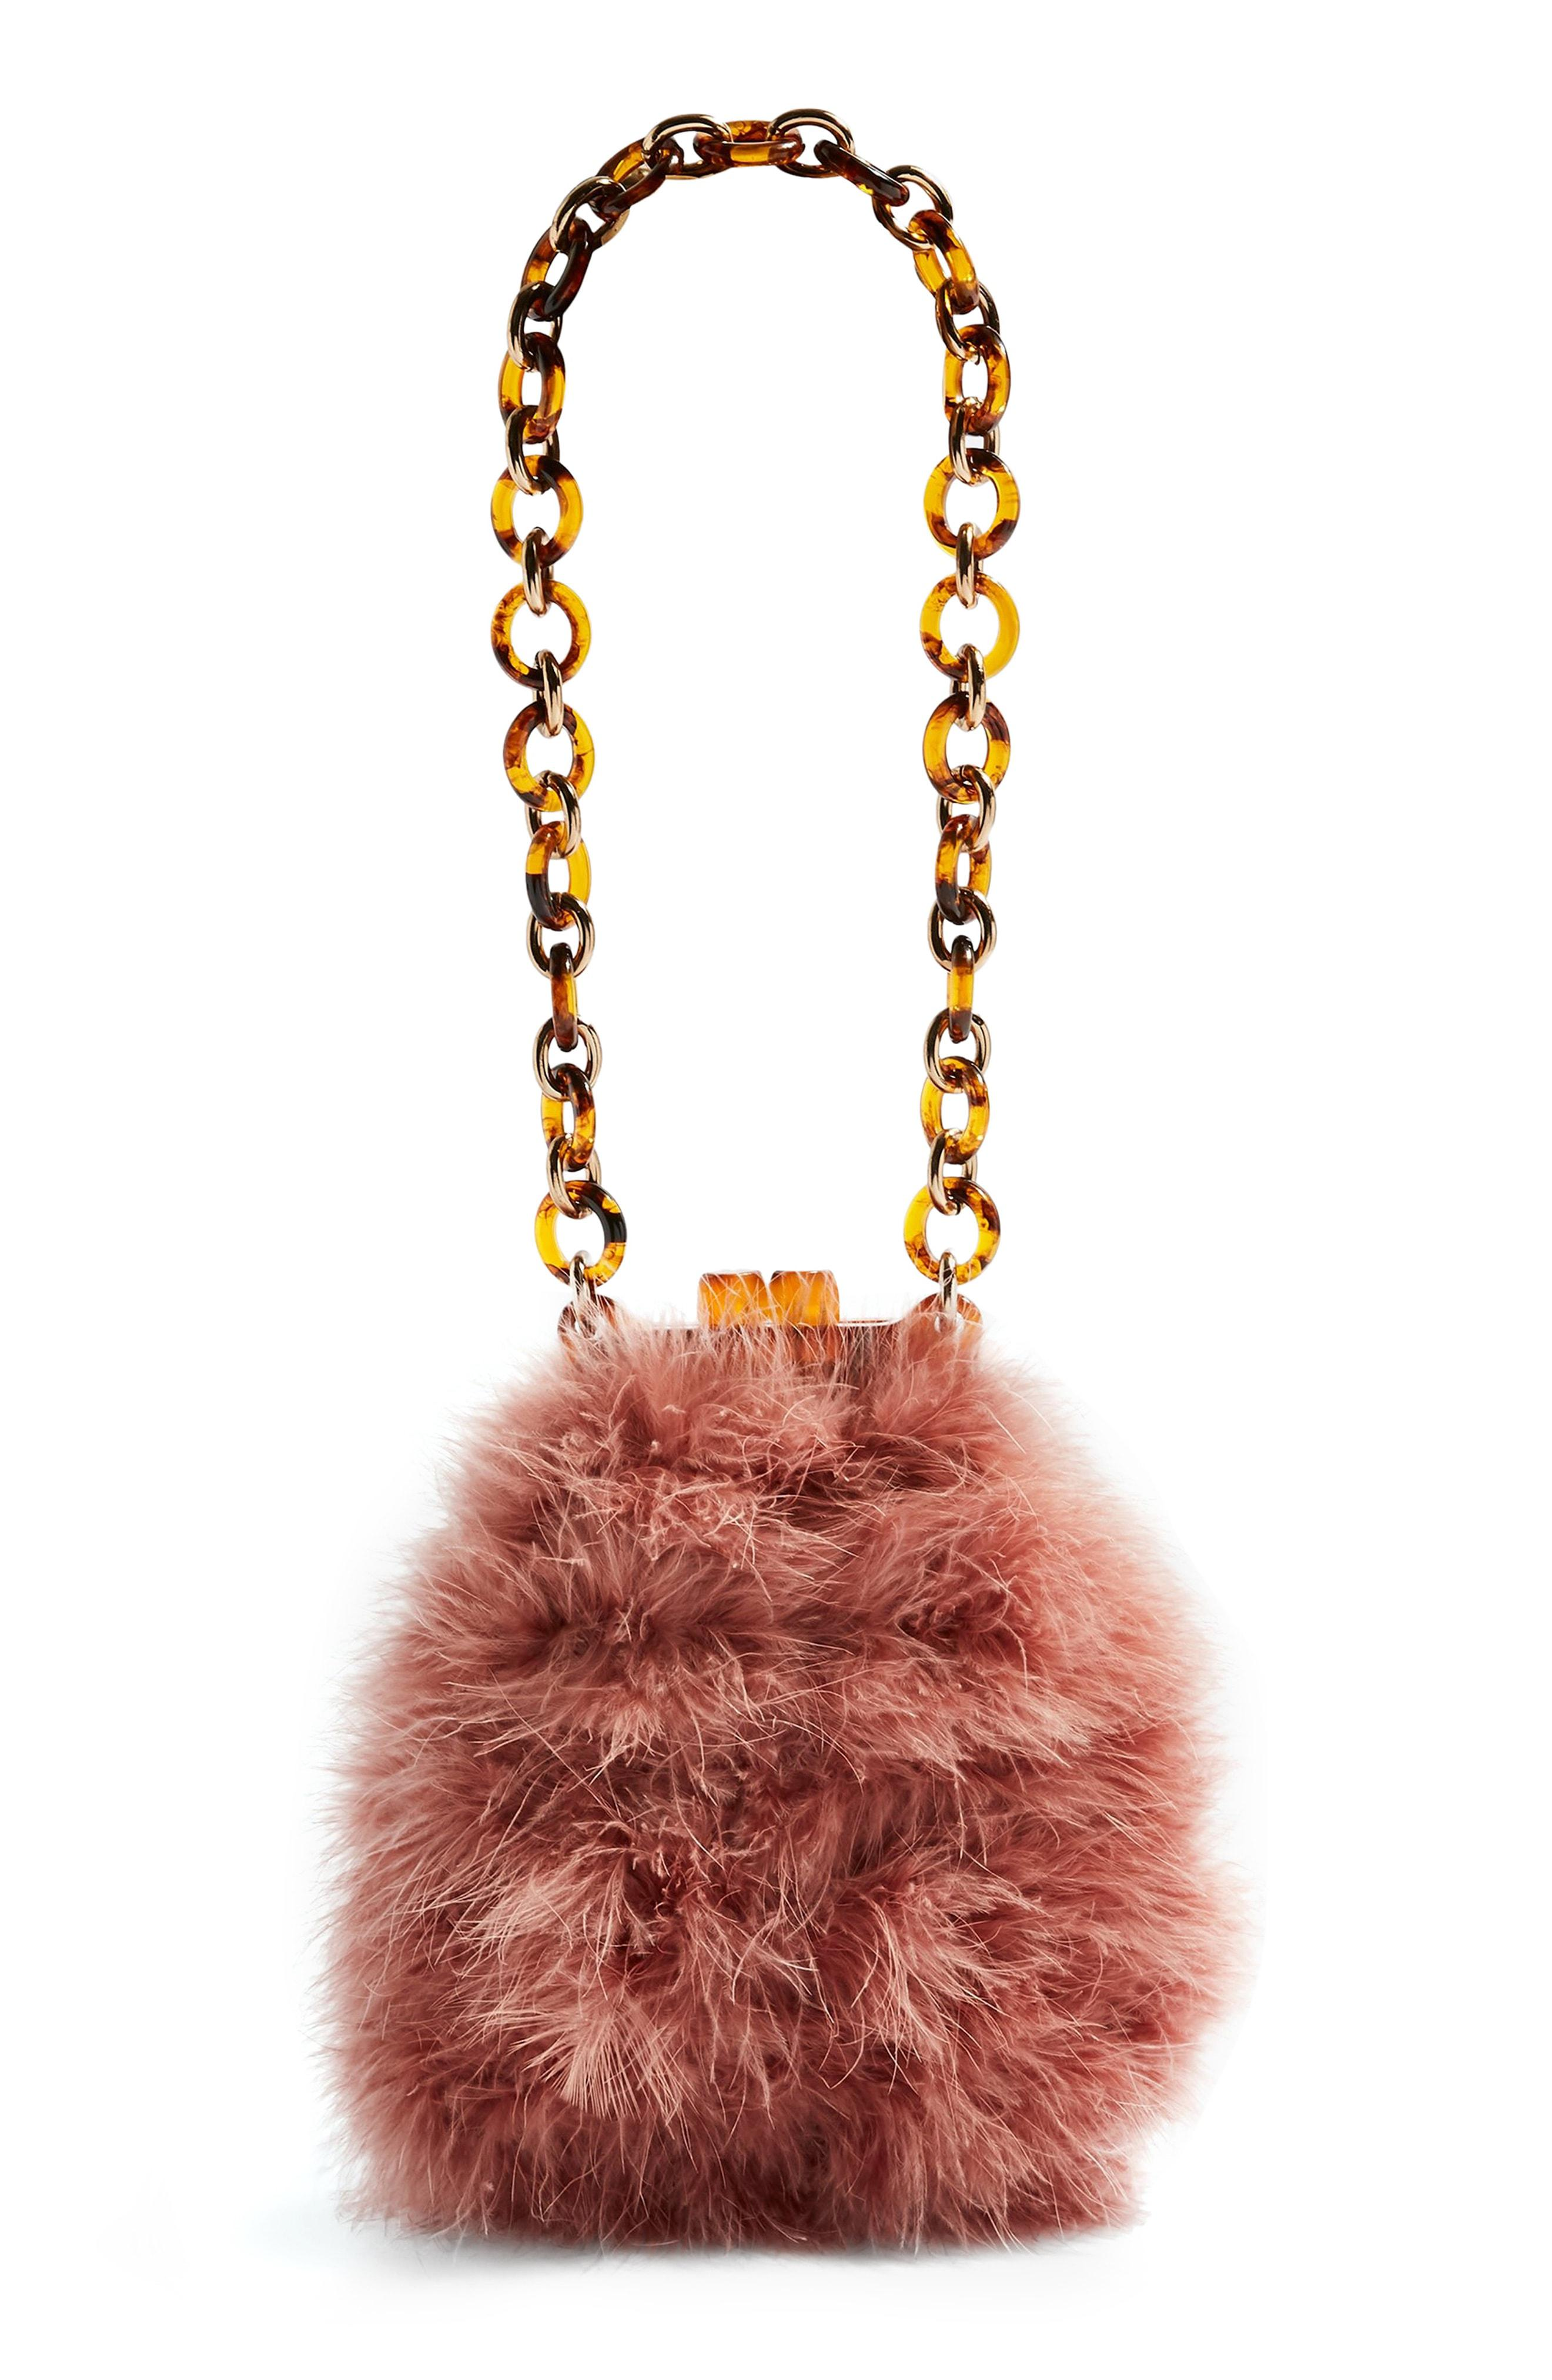 Lyst - TOPSHOP Marabou Clip Frame Bag in Pink 73e9d57b8e878